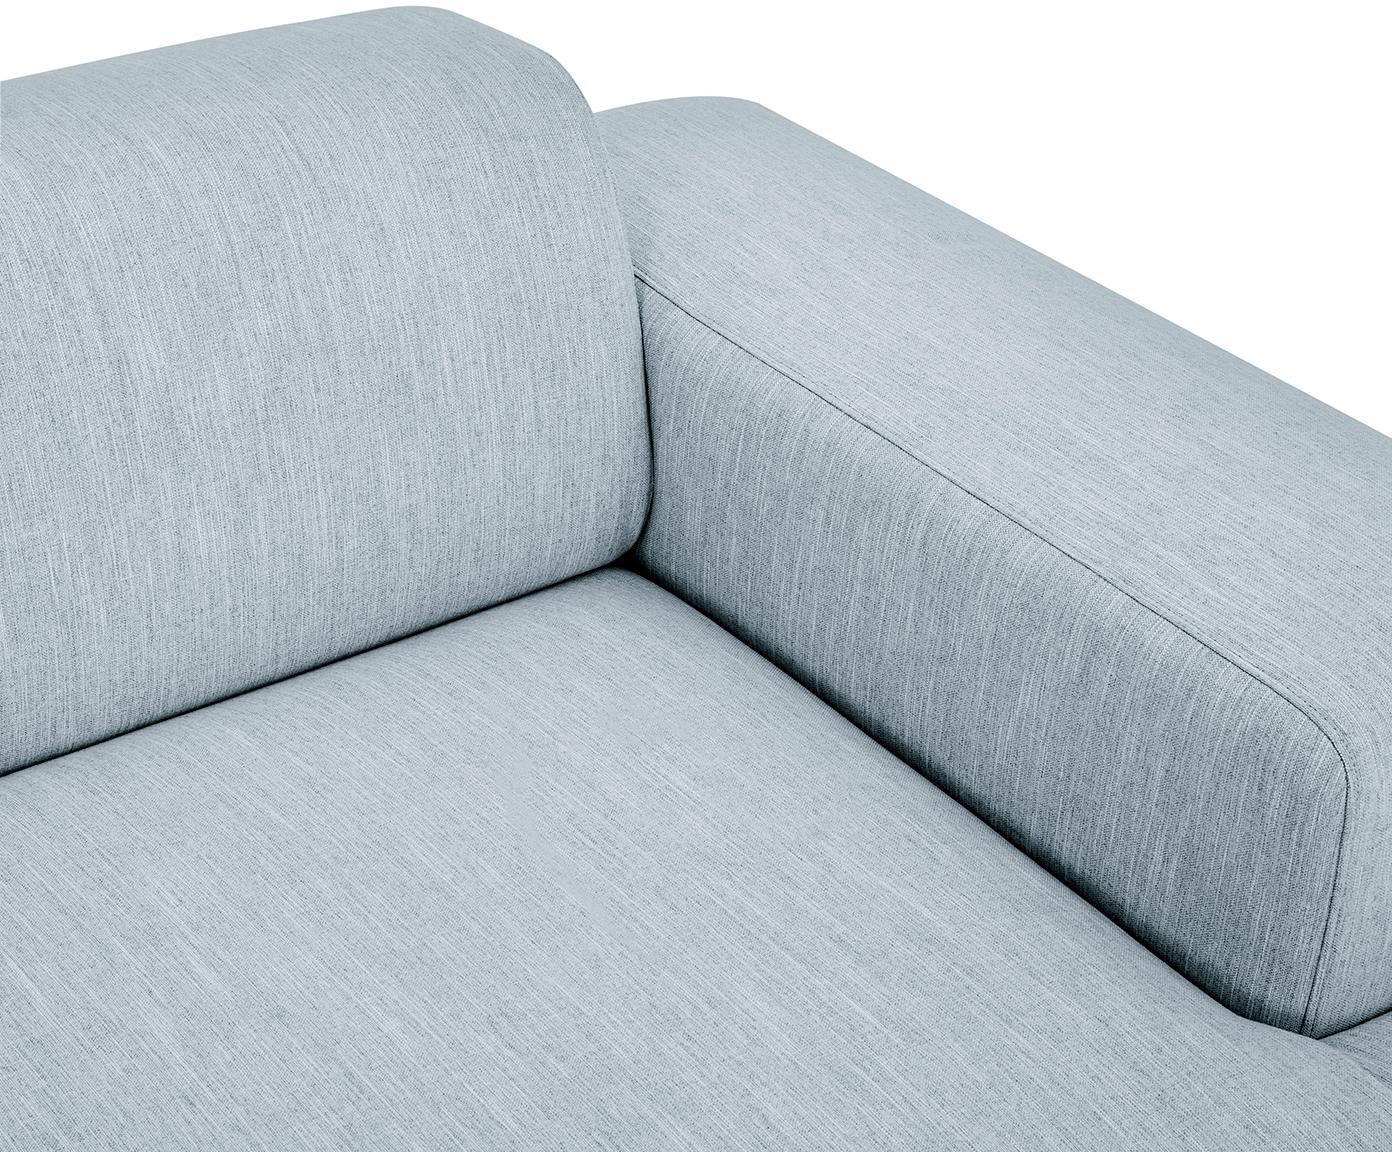 Ecksofa Melva (4-Sitzer), Bezug: Polyester 35.000 Scheuert, Gestell: Massives Kiefernholz, Spa, Füße: Kiefernholz, Webstoff Blaugrau, B 319 x T 144 cm